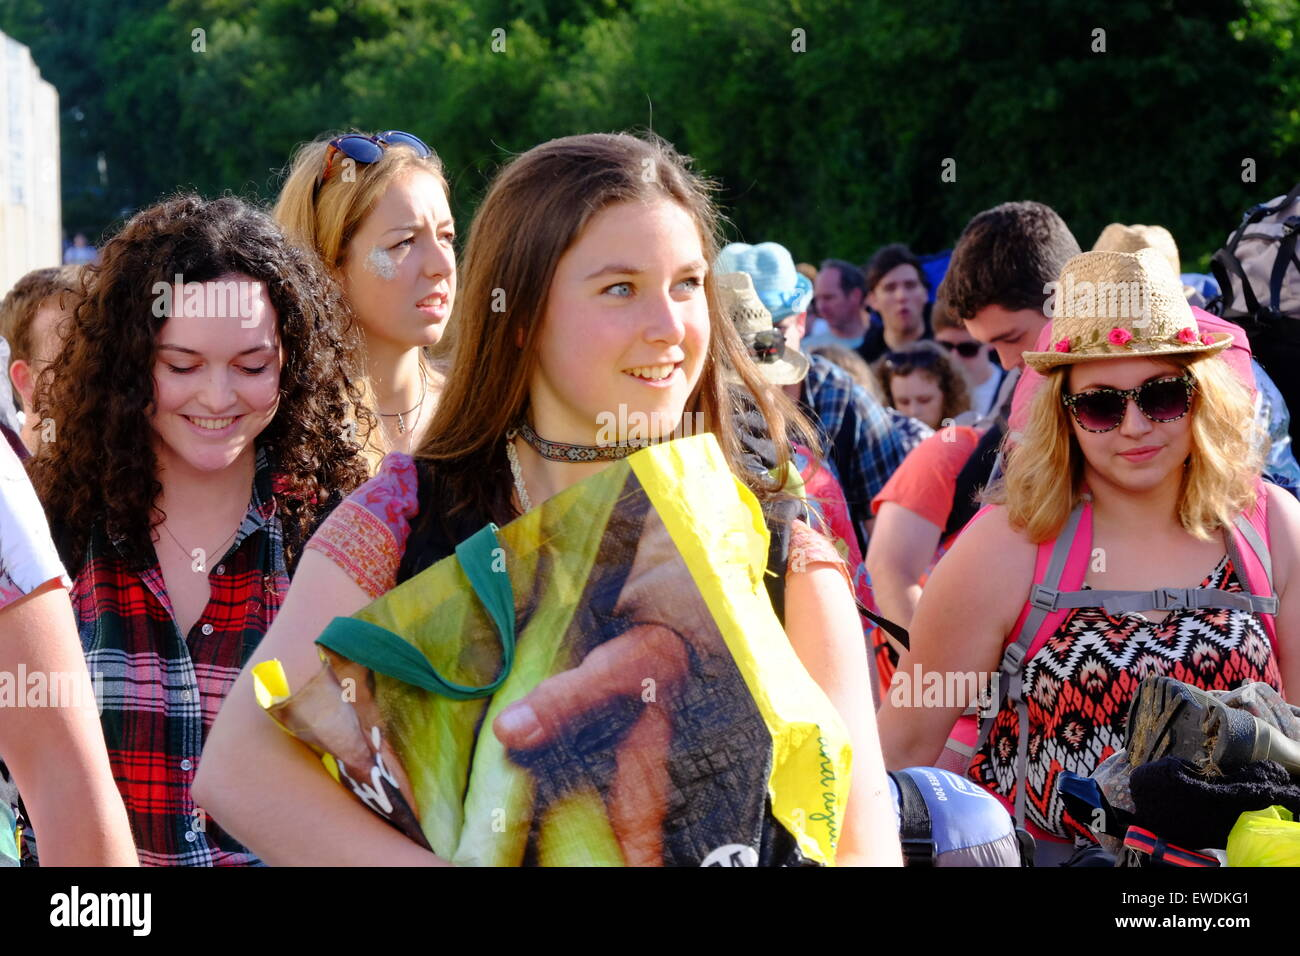 Glastonbury Festival, Somerset, UK. 24 June 2015. As the gates open for the 2015 Glastonbury Festival crowds swarm - Stock Image